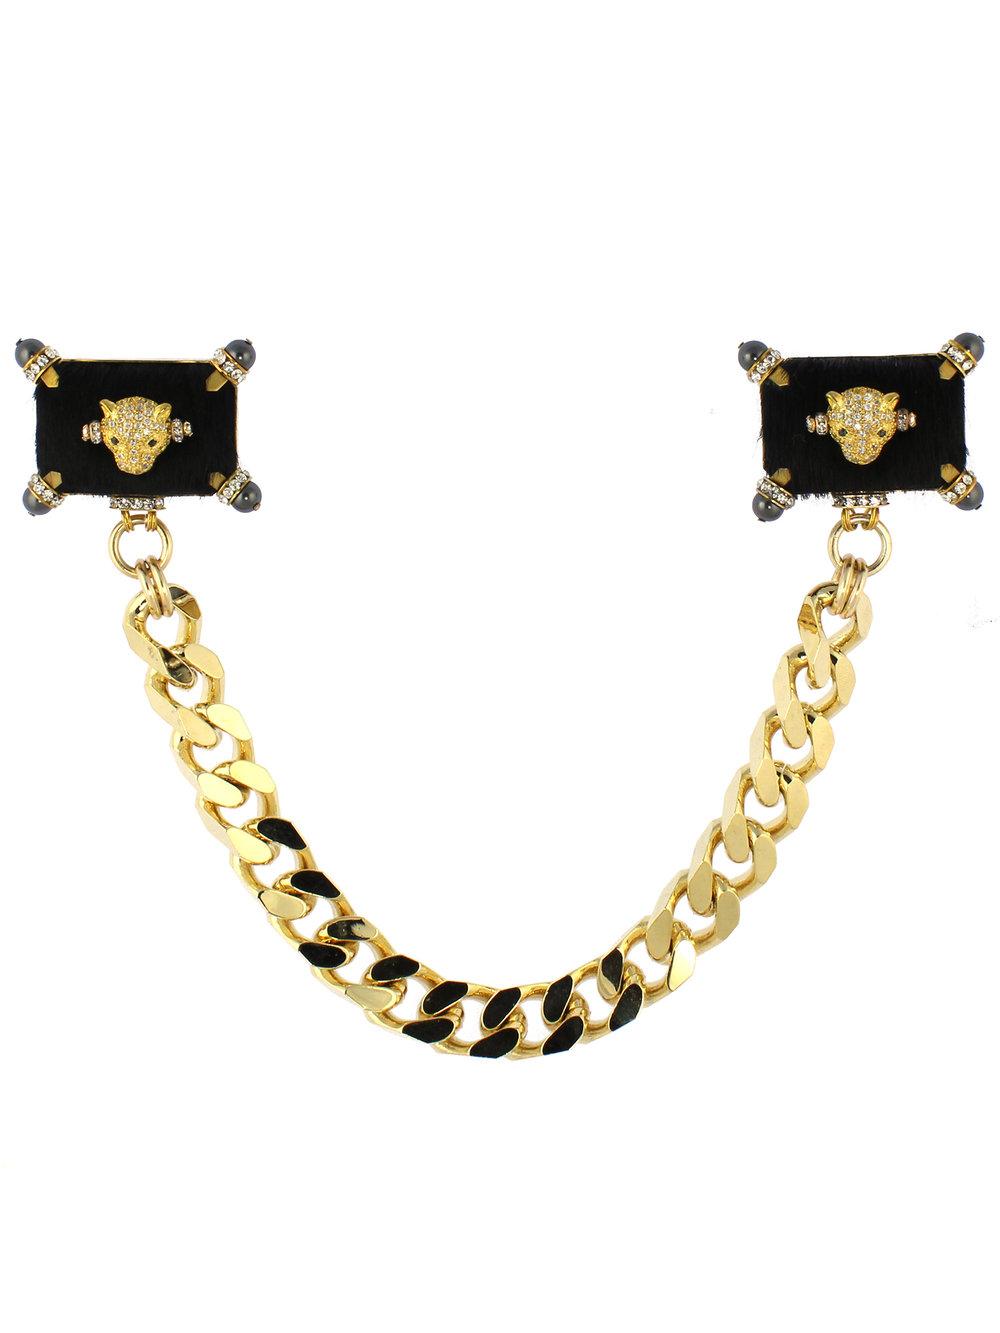 249BR Black & Gold Ponyskin Cheetah Double Brooch.jpg